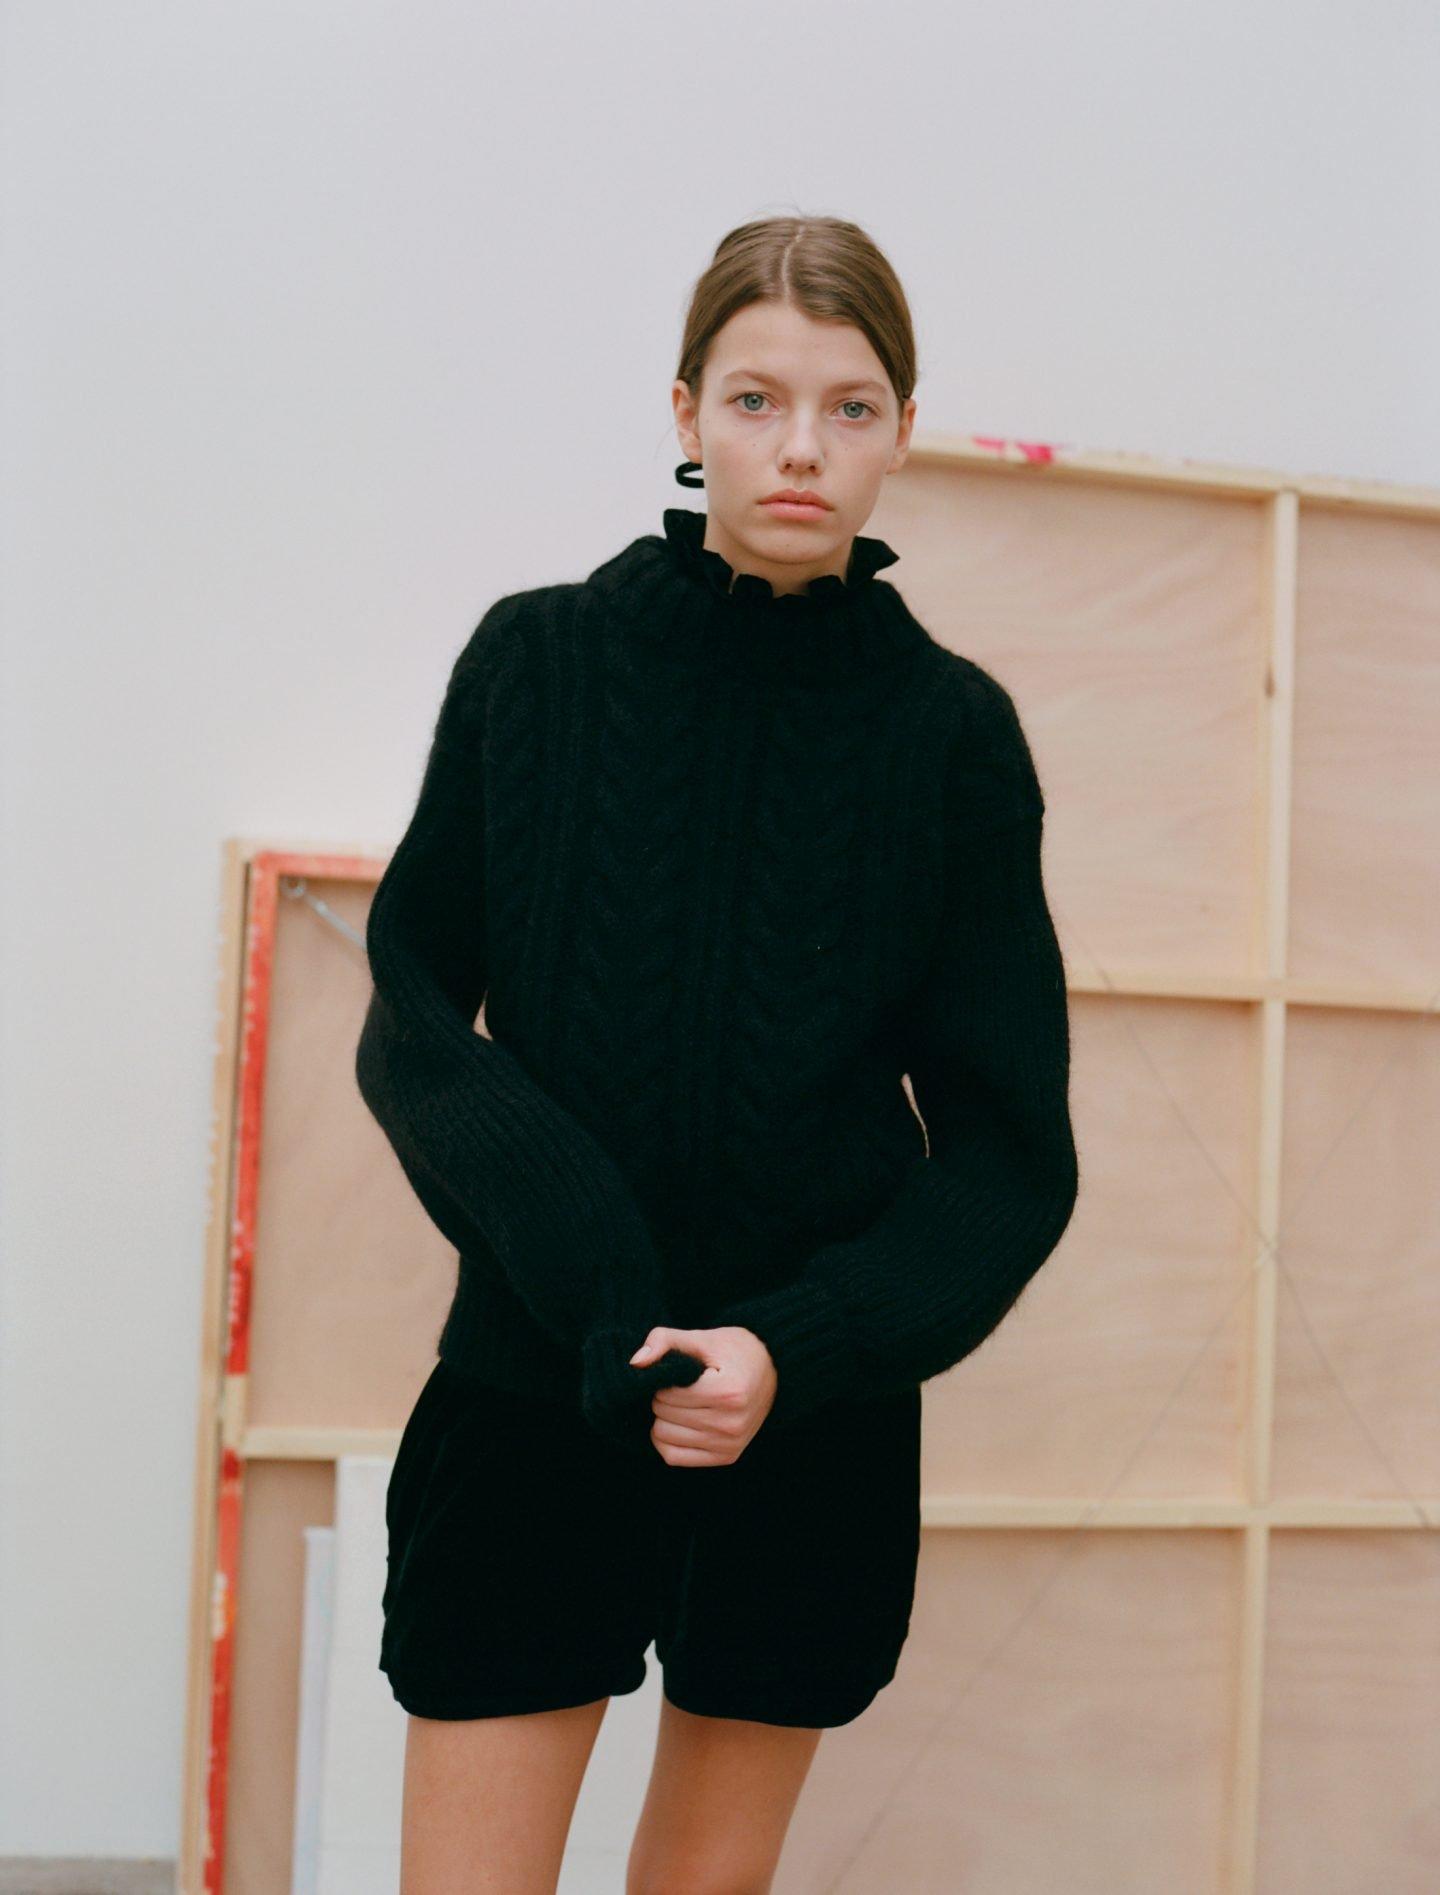 iGNANT-Design-Cecilie-Bahnsen-014